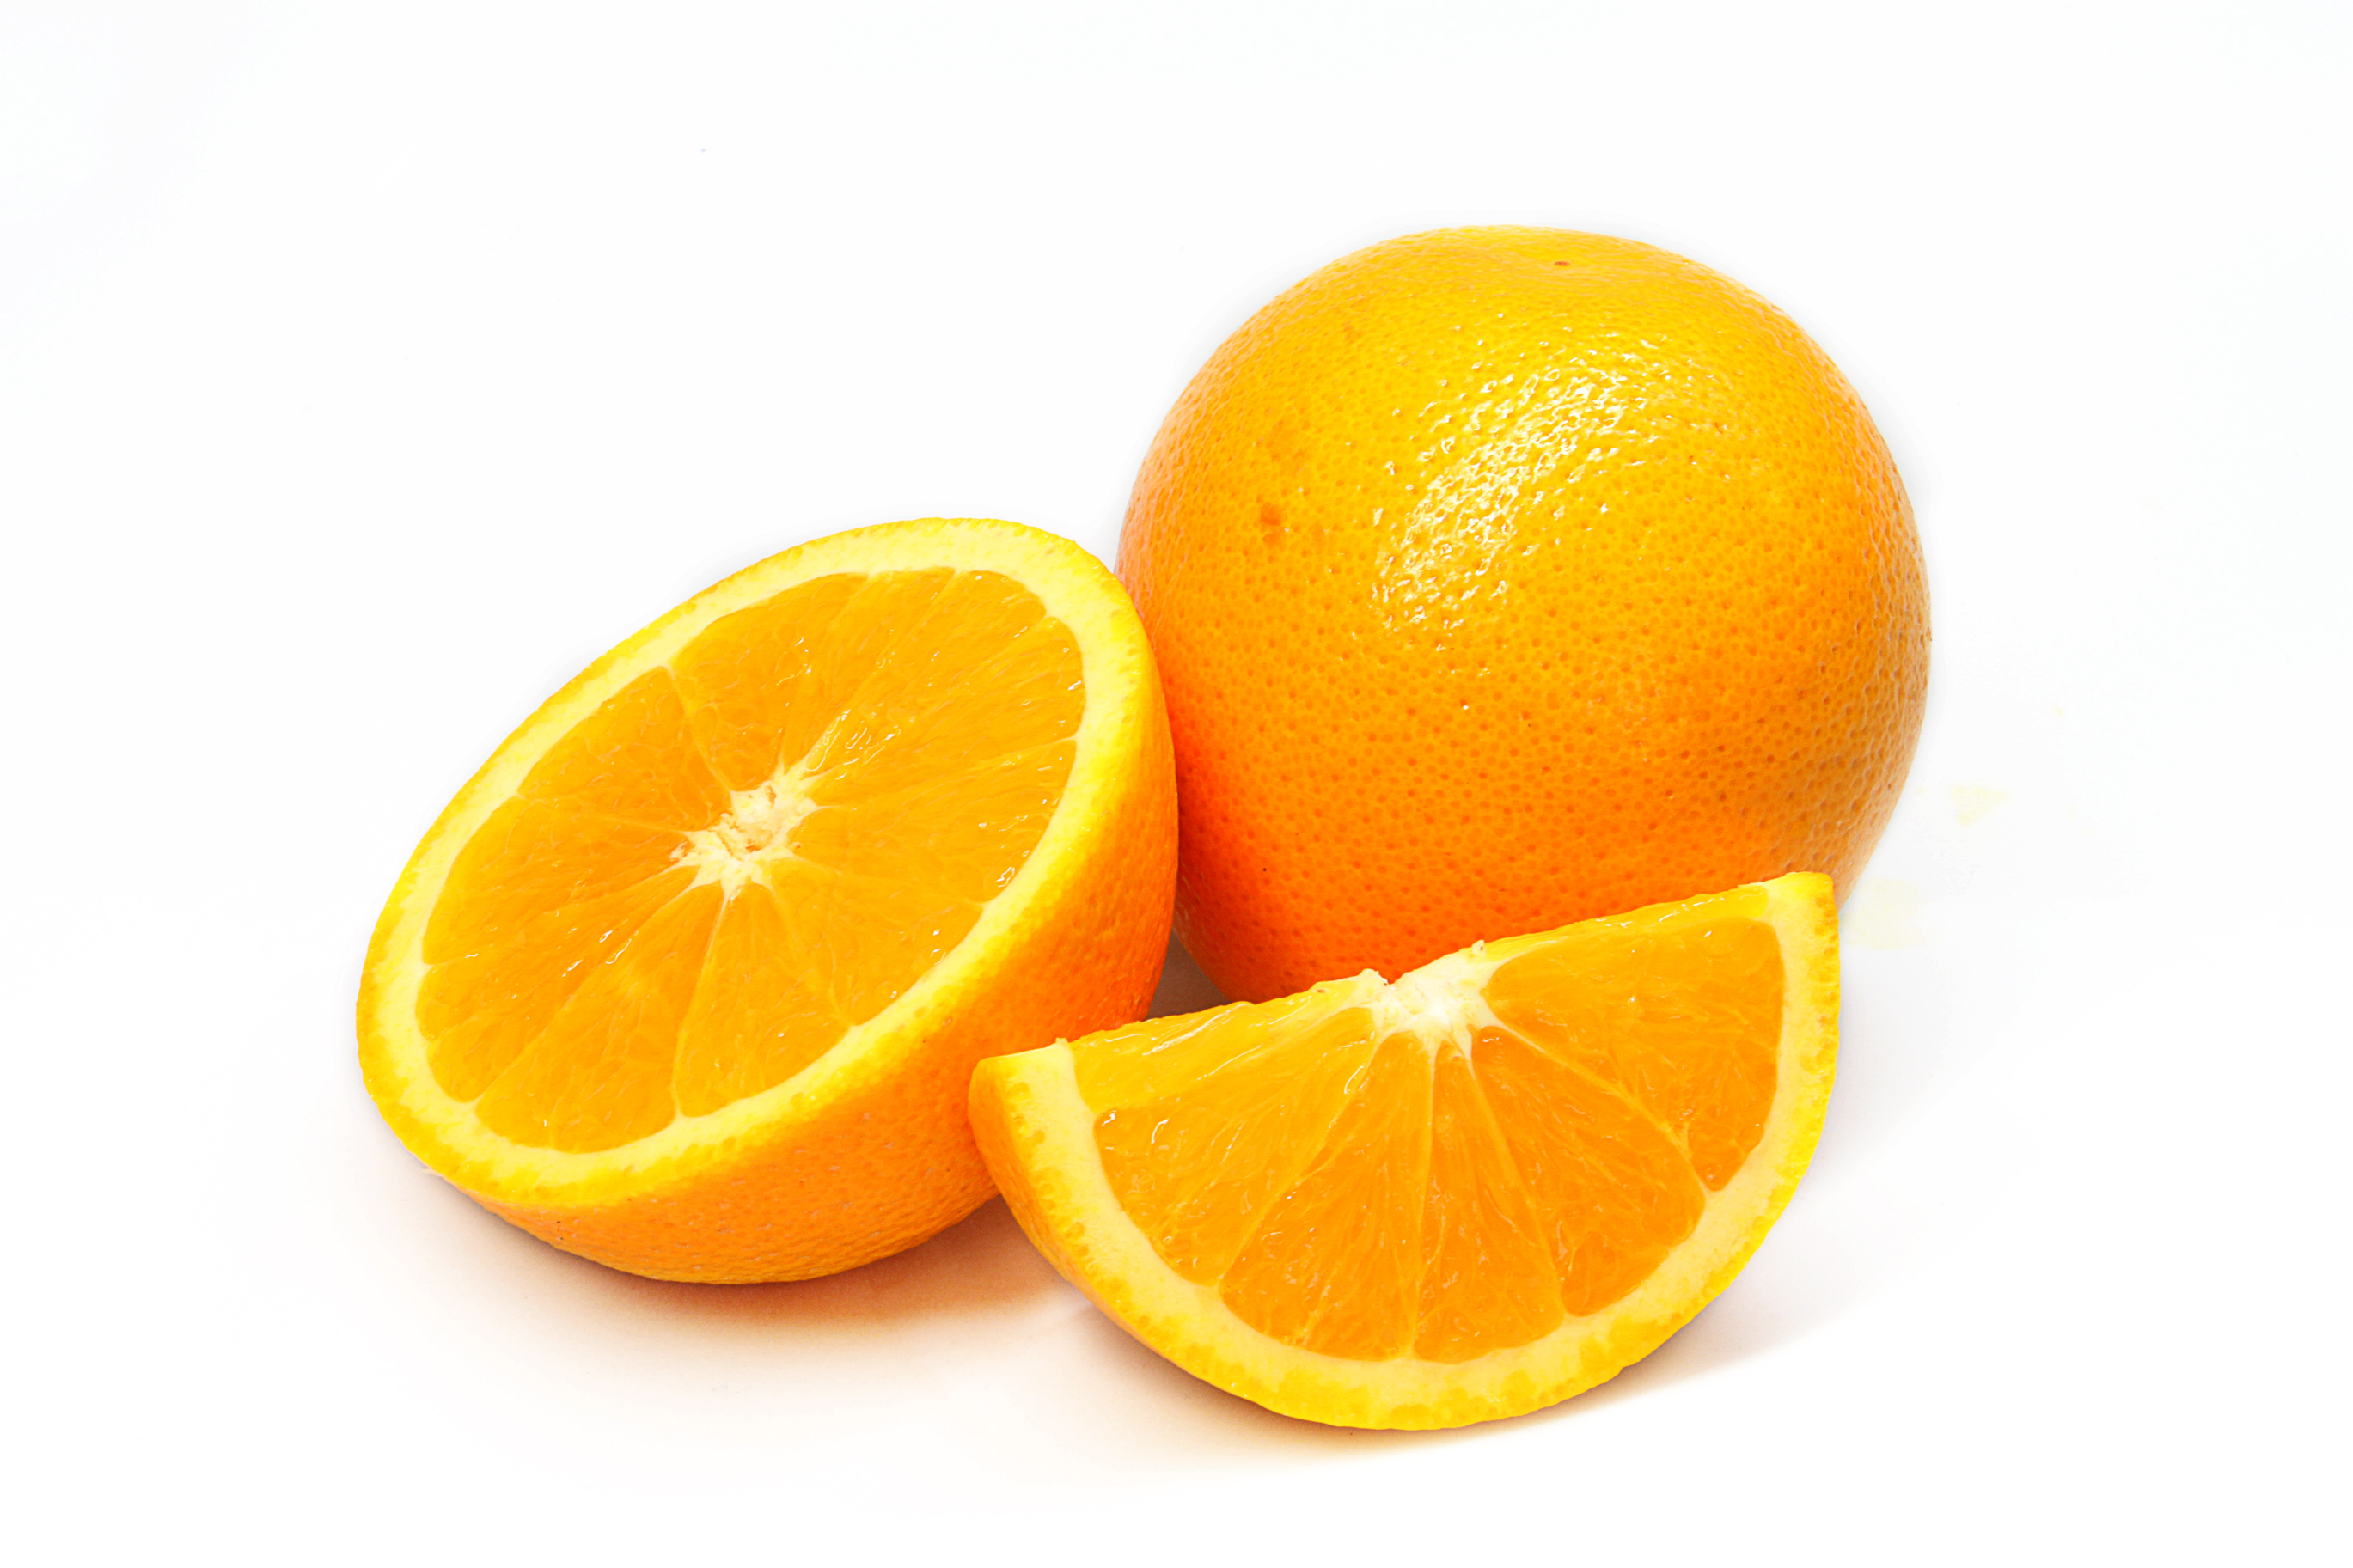 Orange images Orange Fruit HD wallpaper and background photos 2738x1825